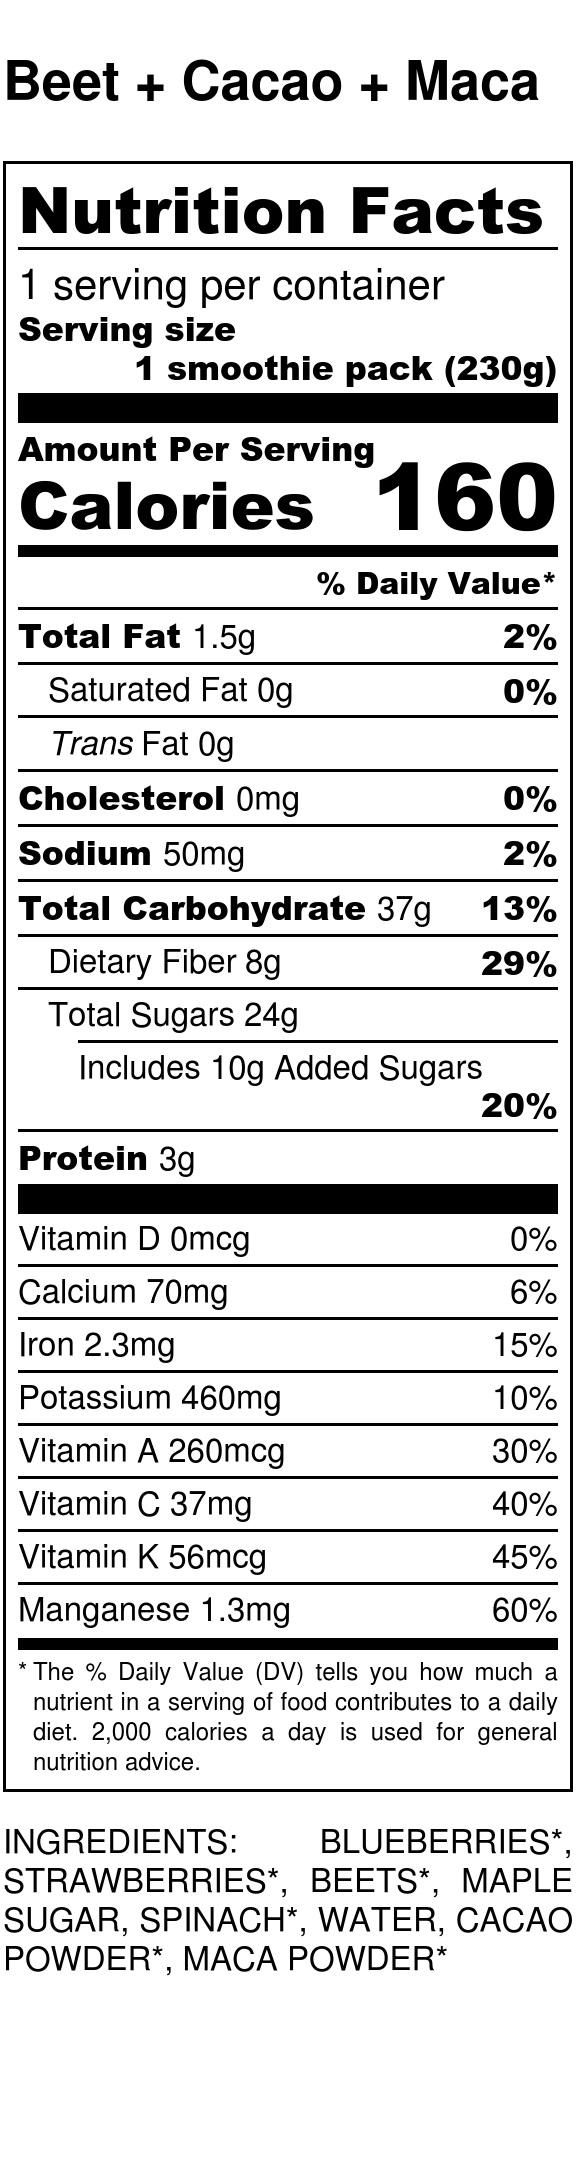 Beet + Cacao + Maca - Nutrition Label.jpg